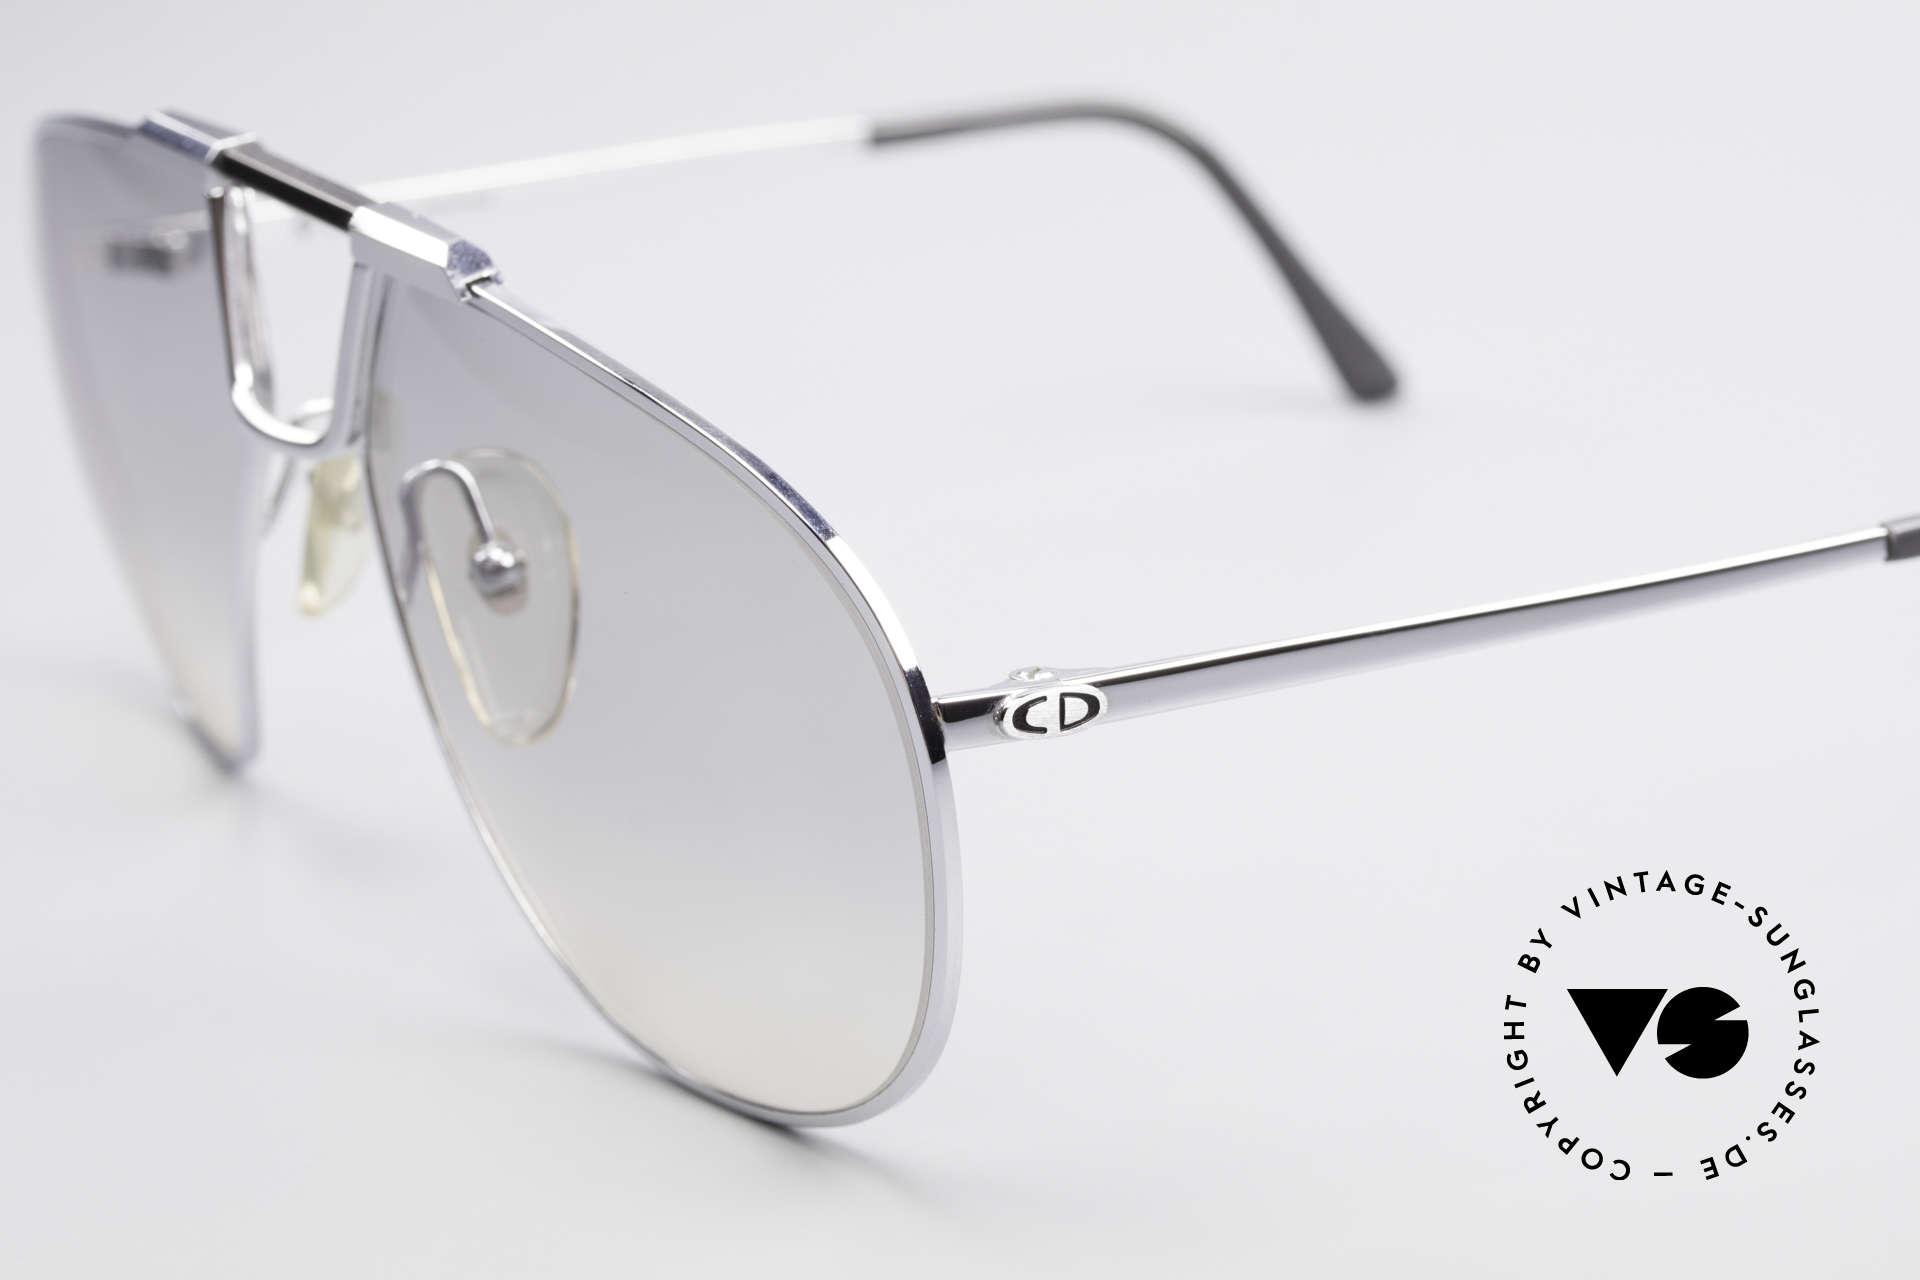 Christian Dior 2151 Monsieur Sunglasses Medium, MEDIUM size (132mm width) & original CD case, Made for Men